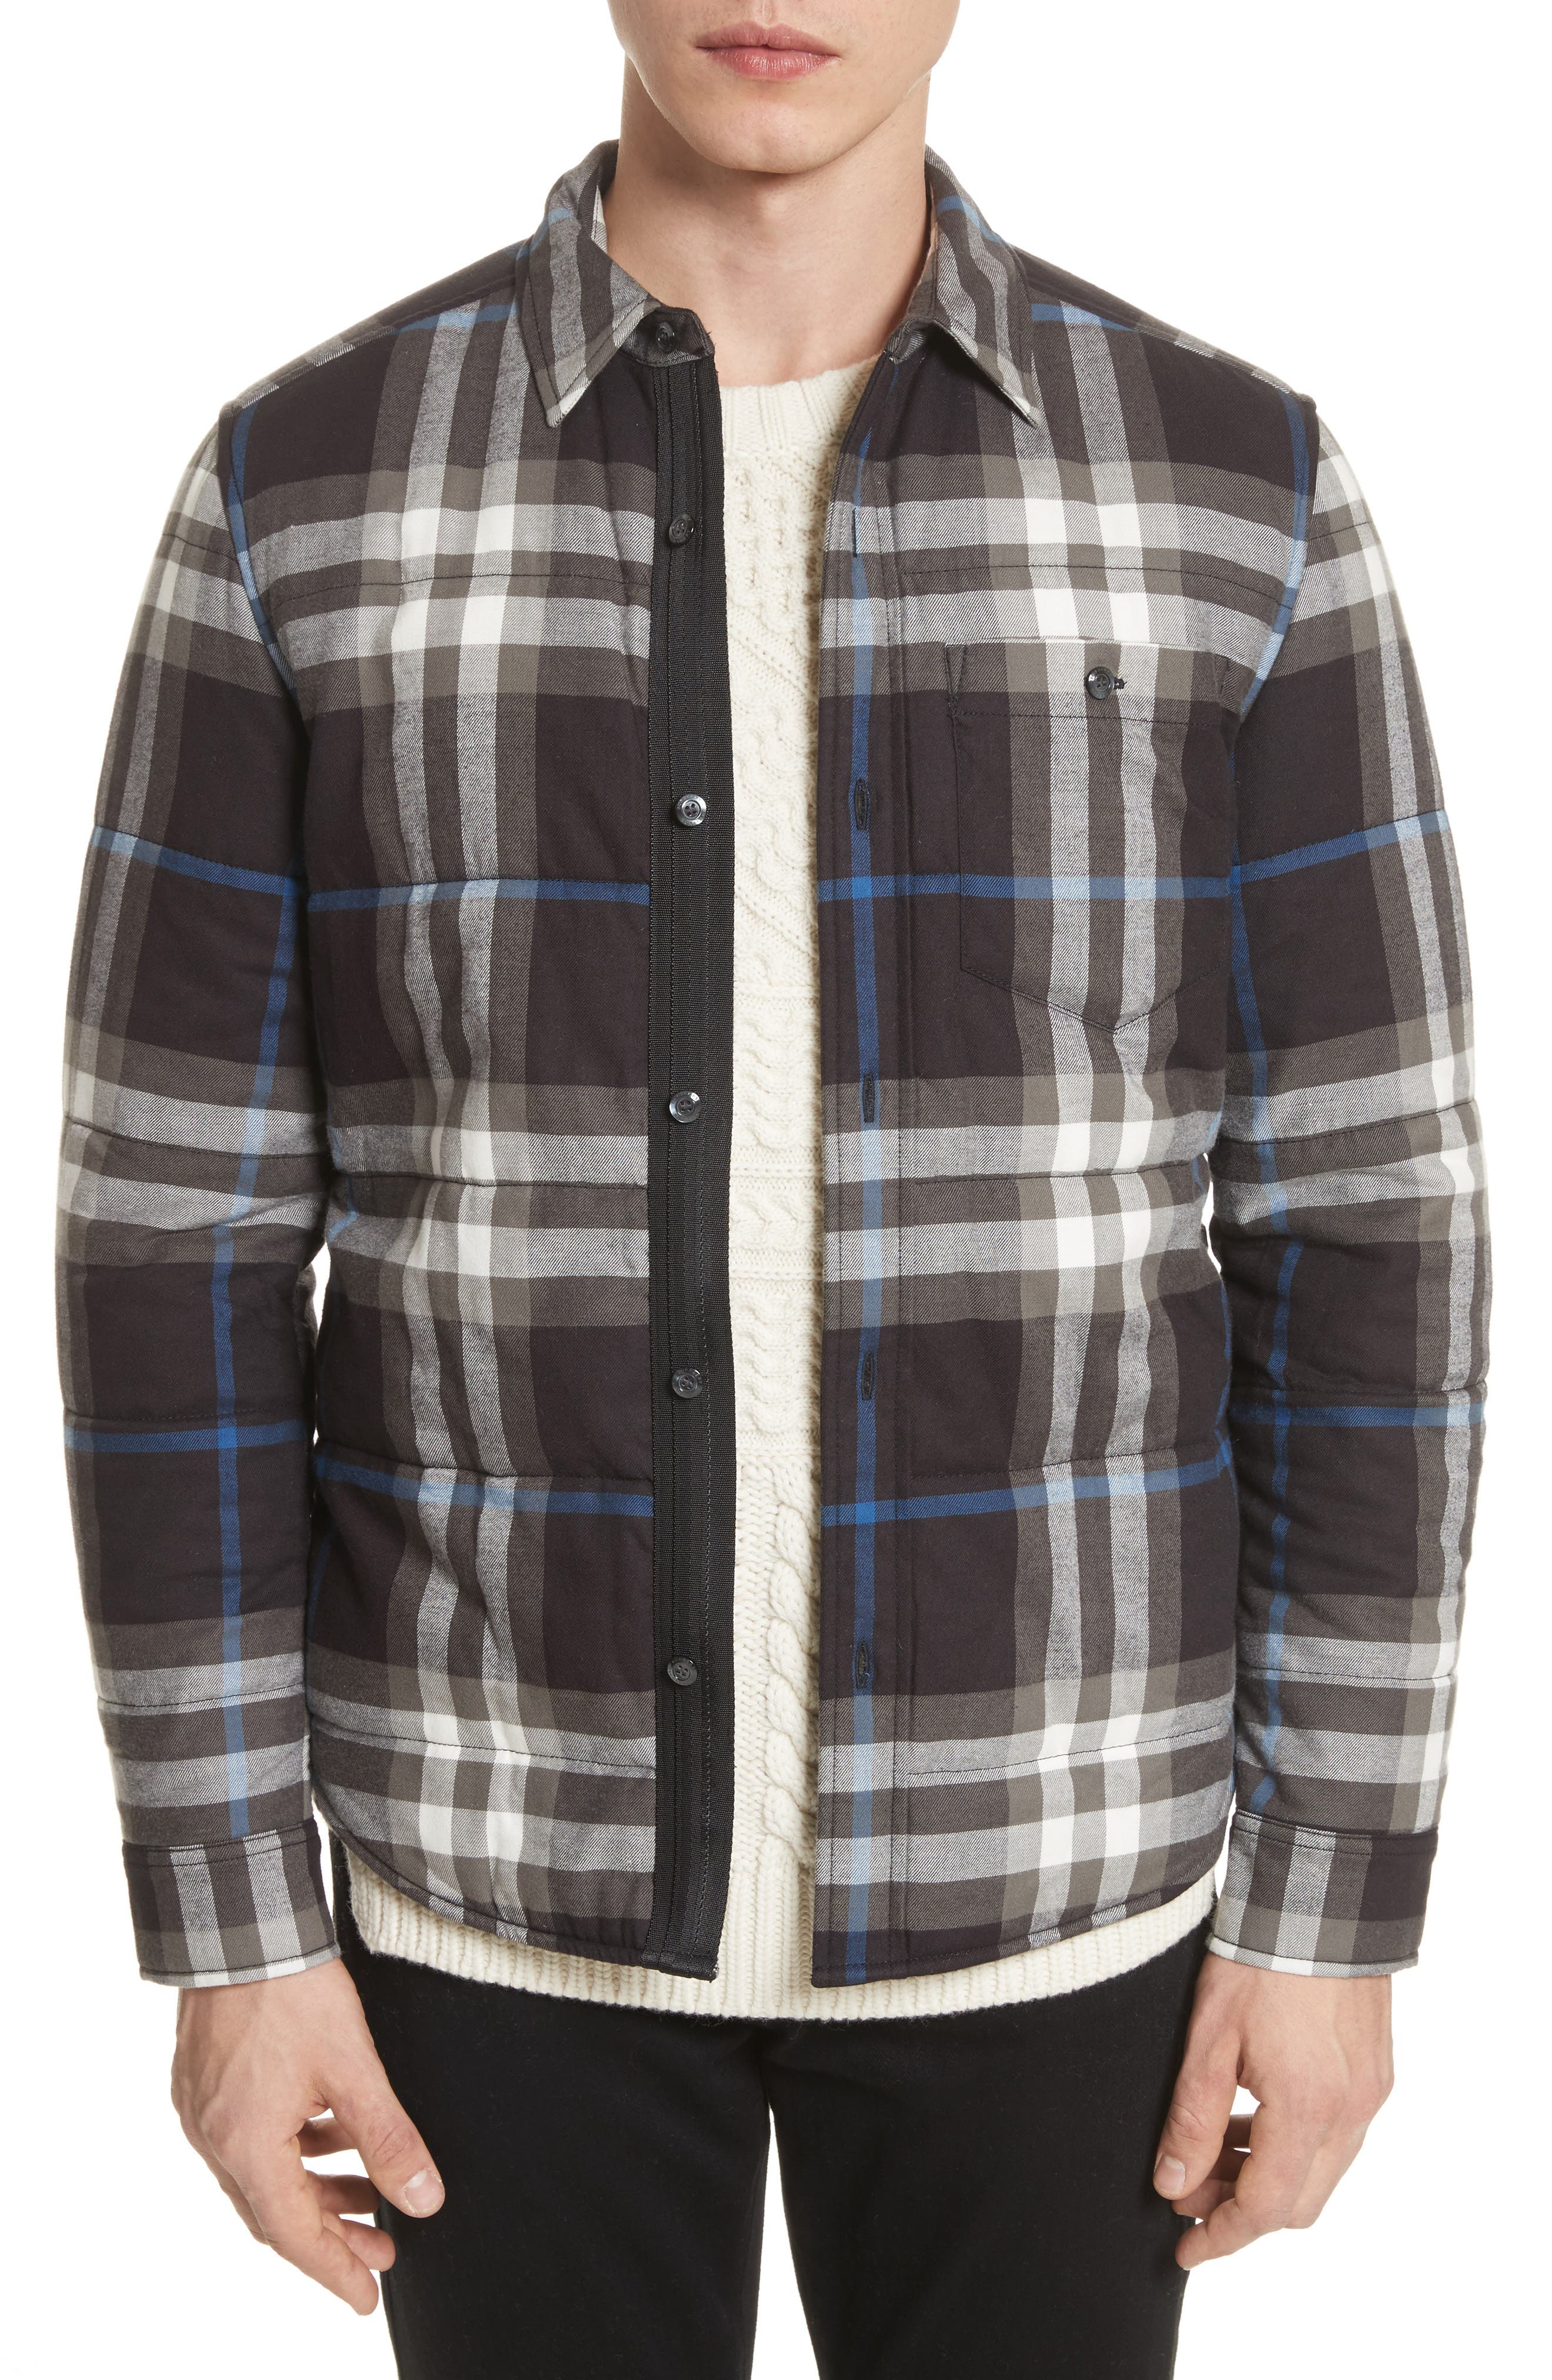 Main Image - Burberry Walsden Plaid Flannel Shirt Jacket